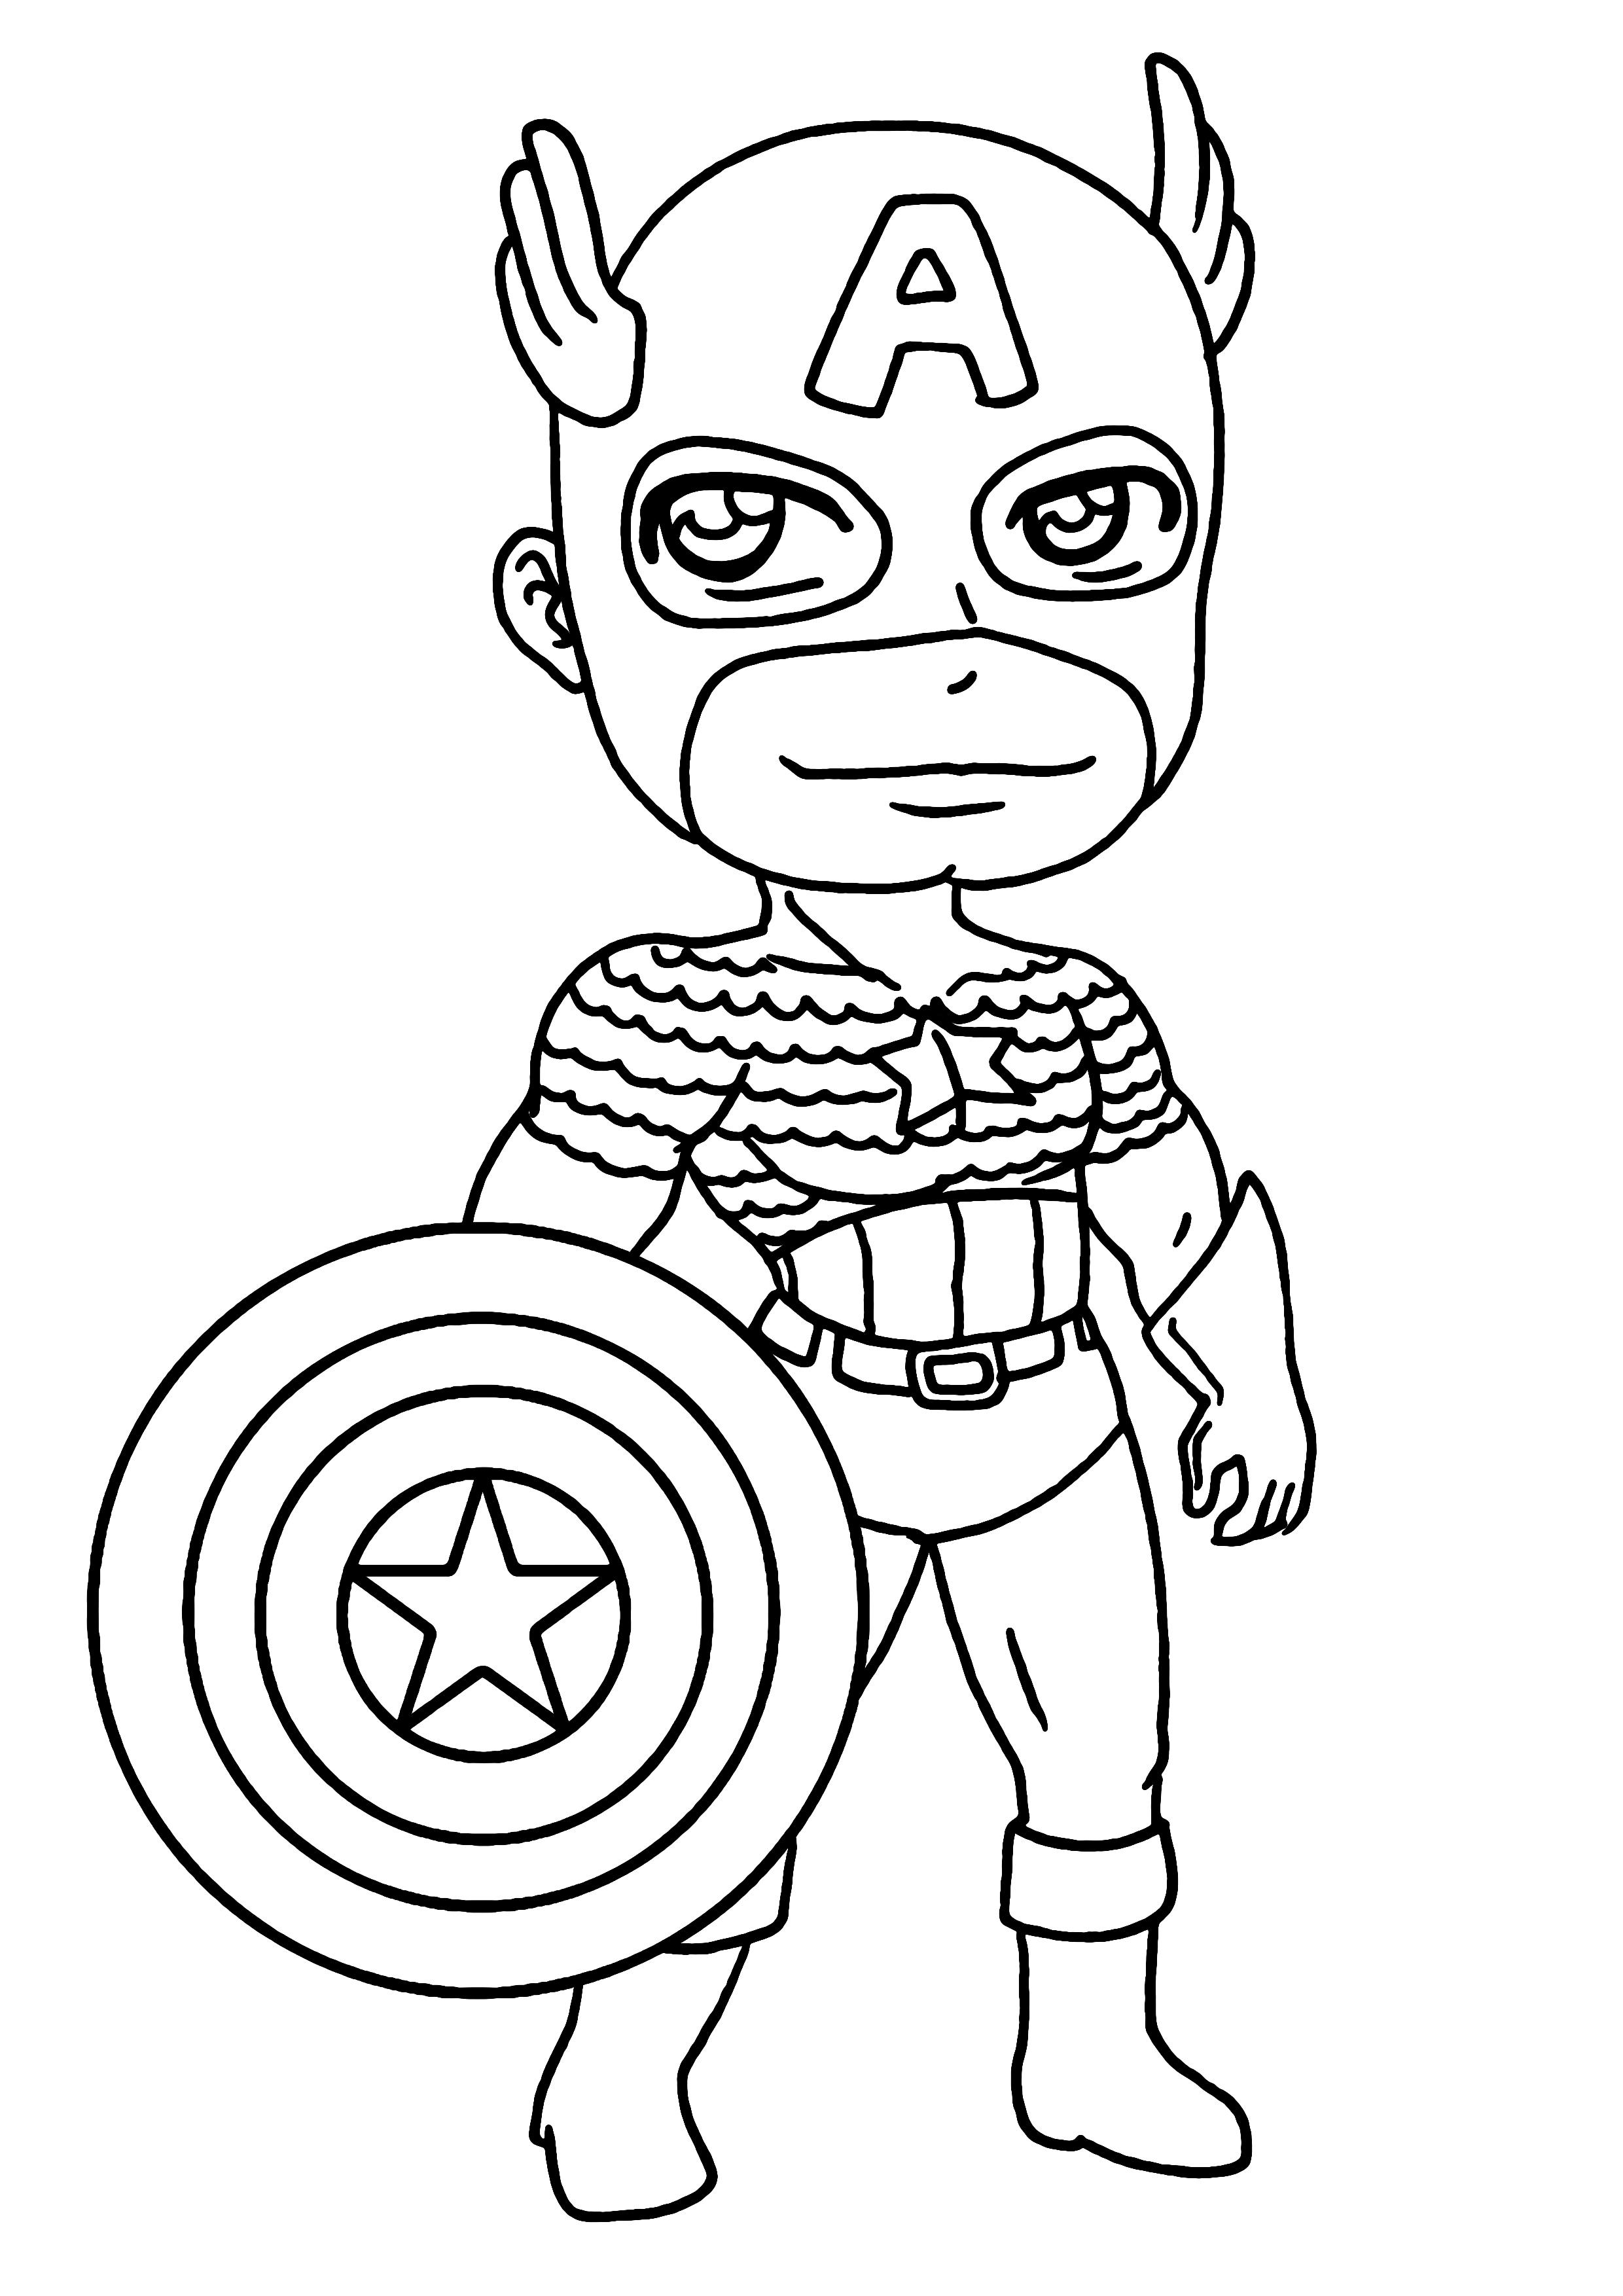 colorier captain america nom du dessin coloriage captain america